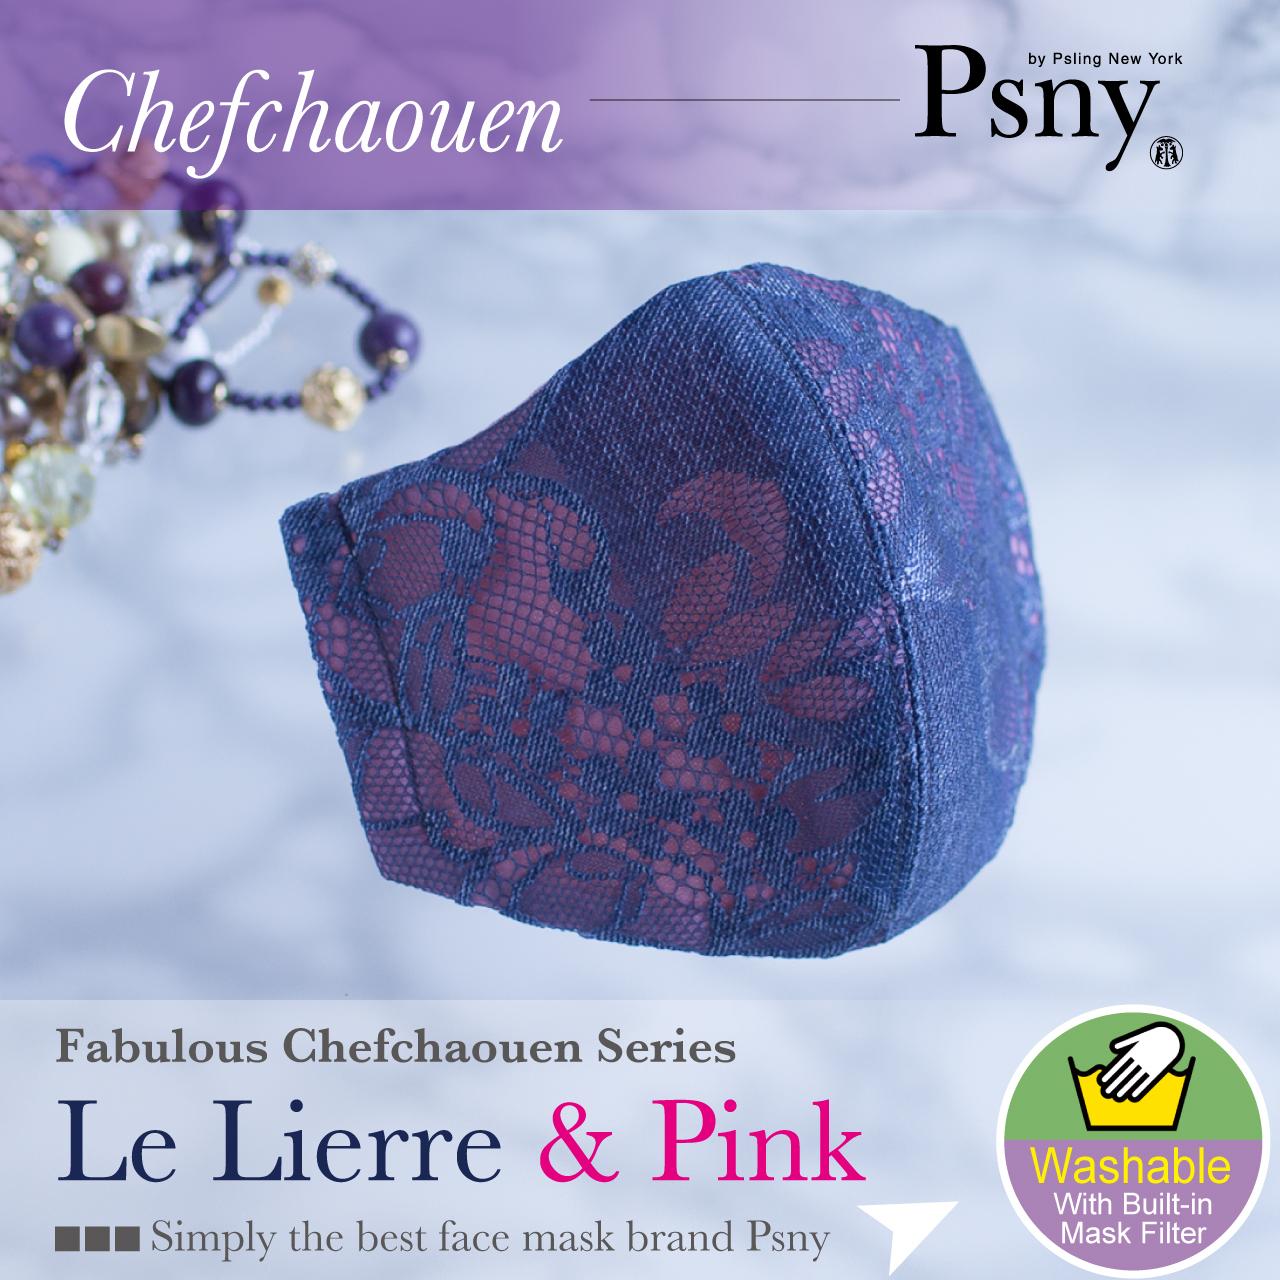 PSNY シャウエン レース・リエール ピンク 花粉 黄砂 洗える不織布フィルター入り 美しい 立体 大人用 マスク 送料無料 LT3